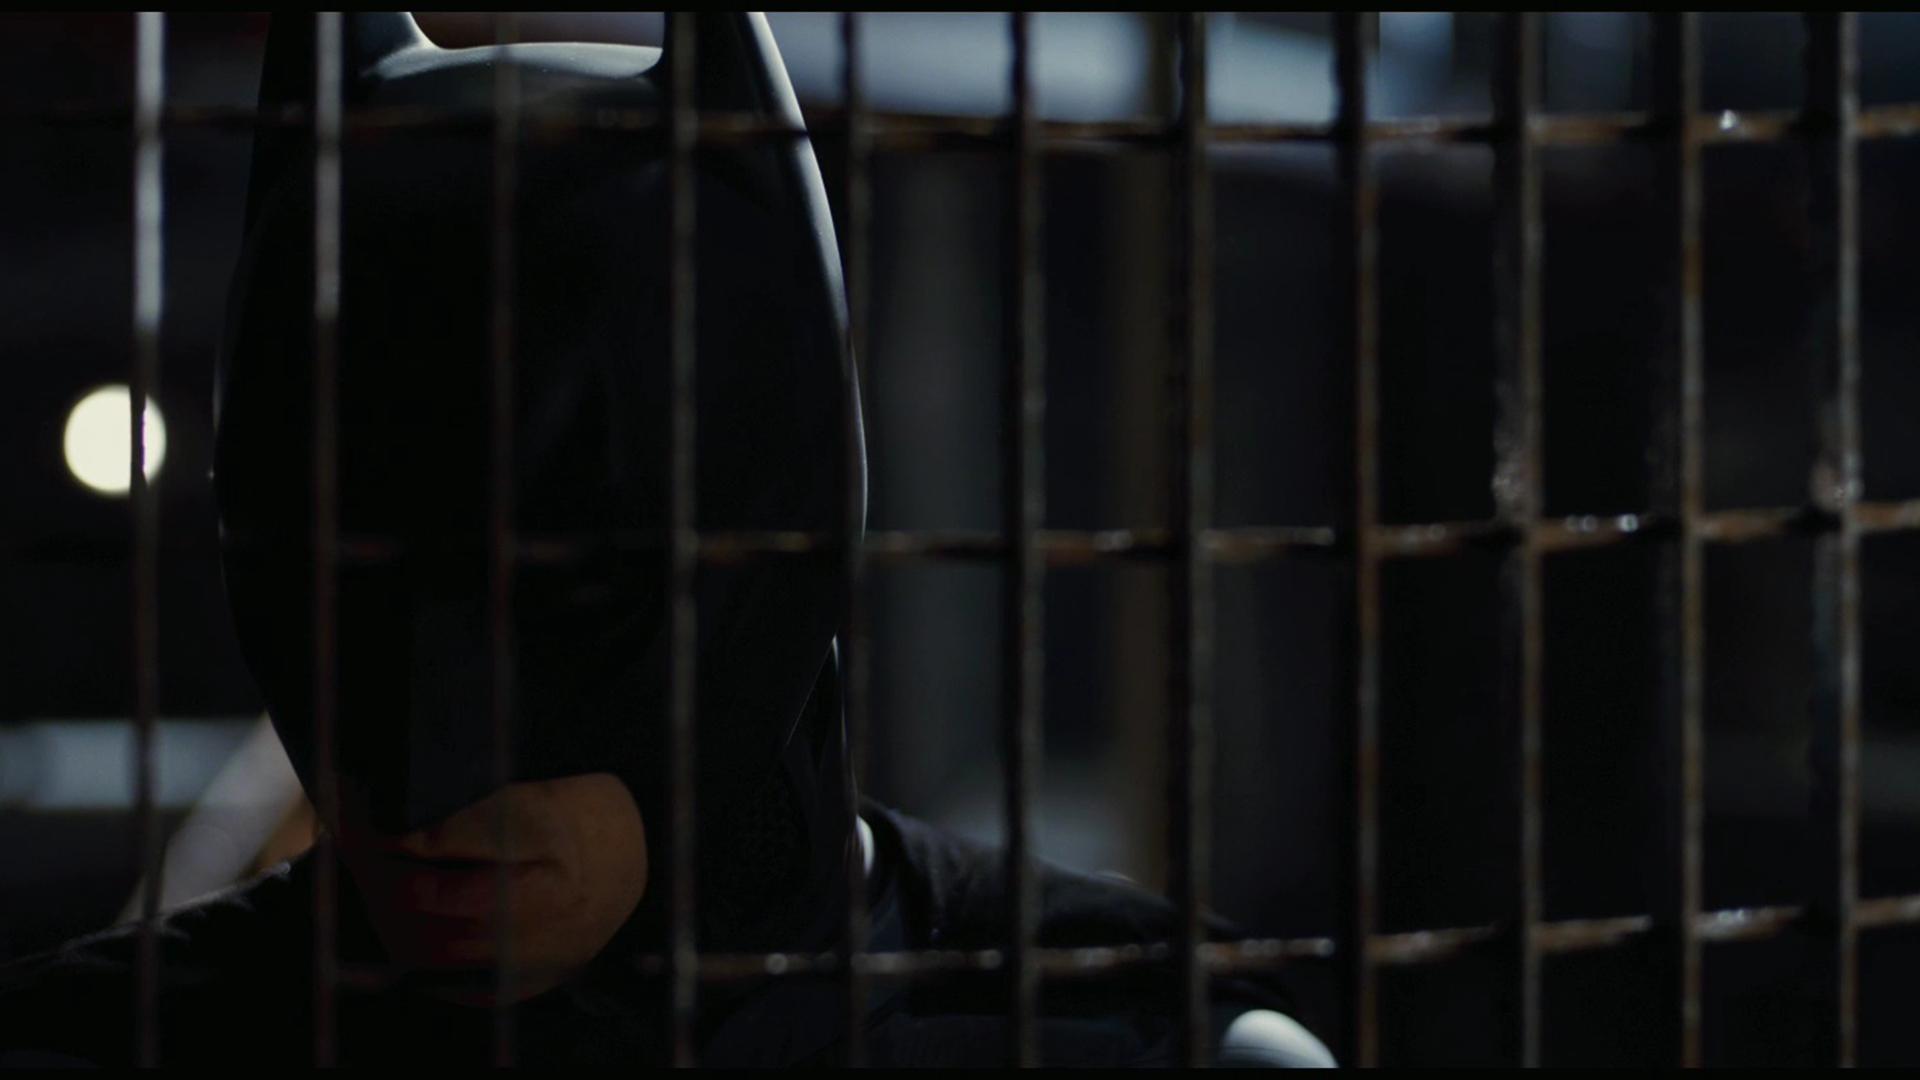 Dark Knight Rises | Free Desktop Wallpapers for Widescreen ...